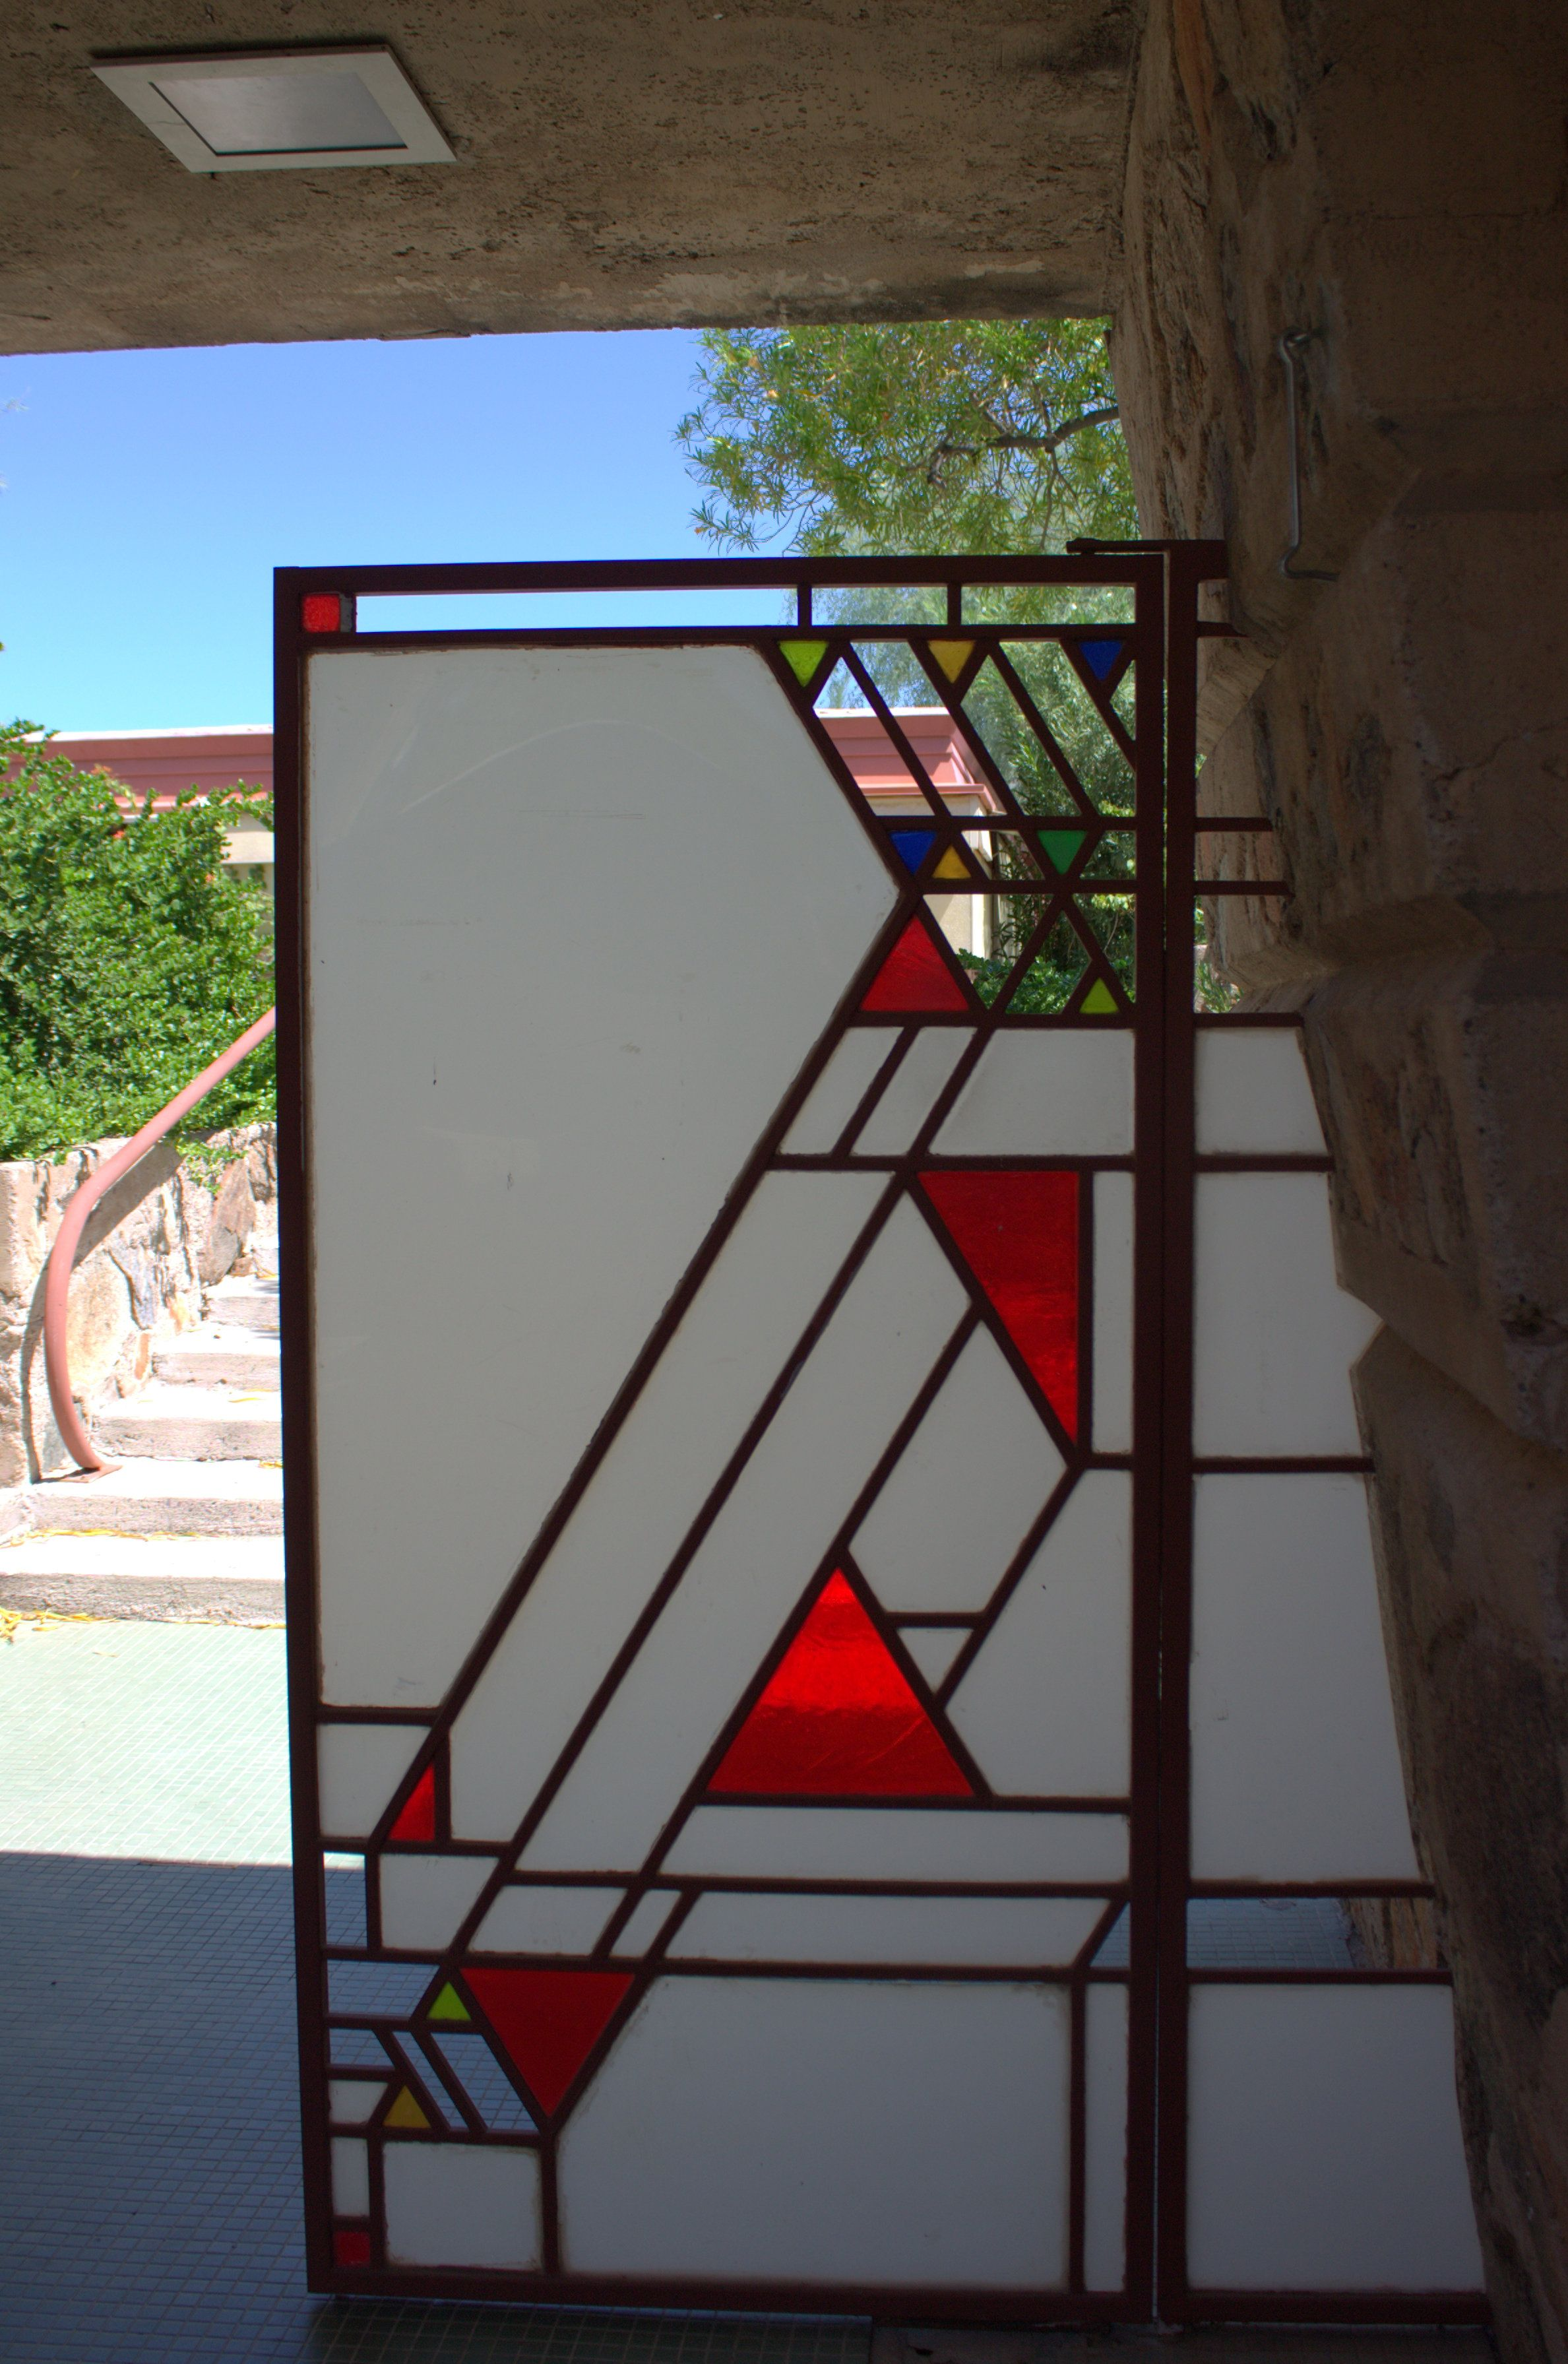 Pareti Divisorie In Vetro Colorato art glass in gate. taliesin west, scottsdale, arizona. frank